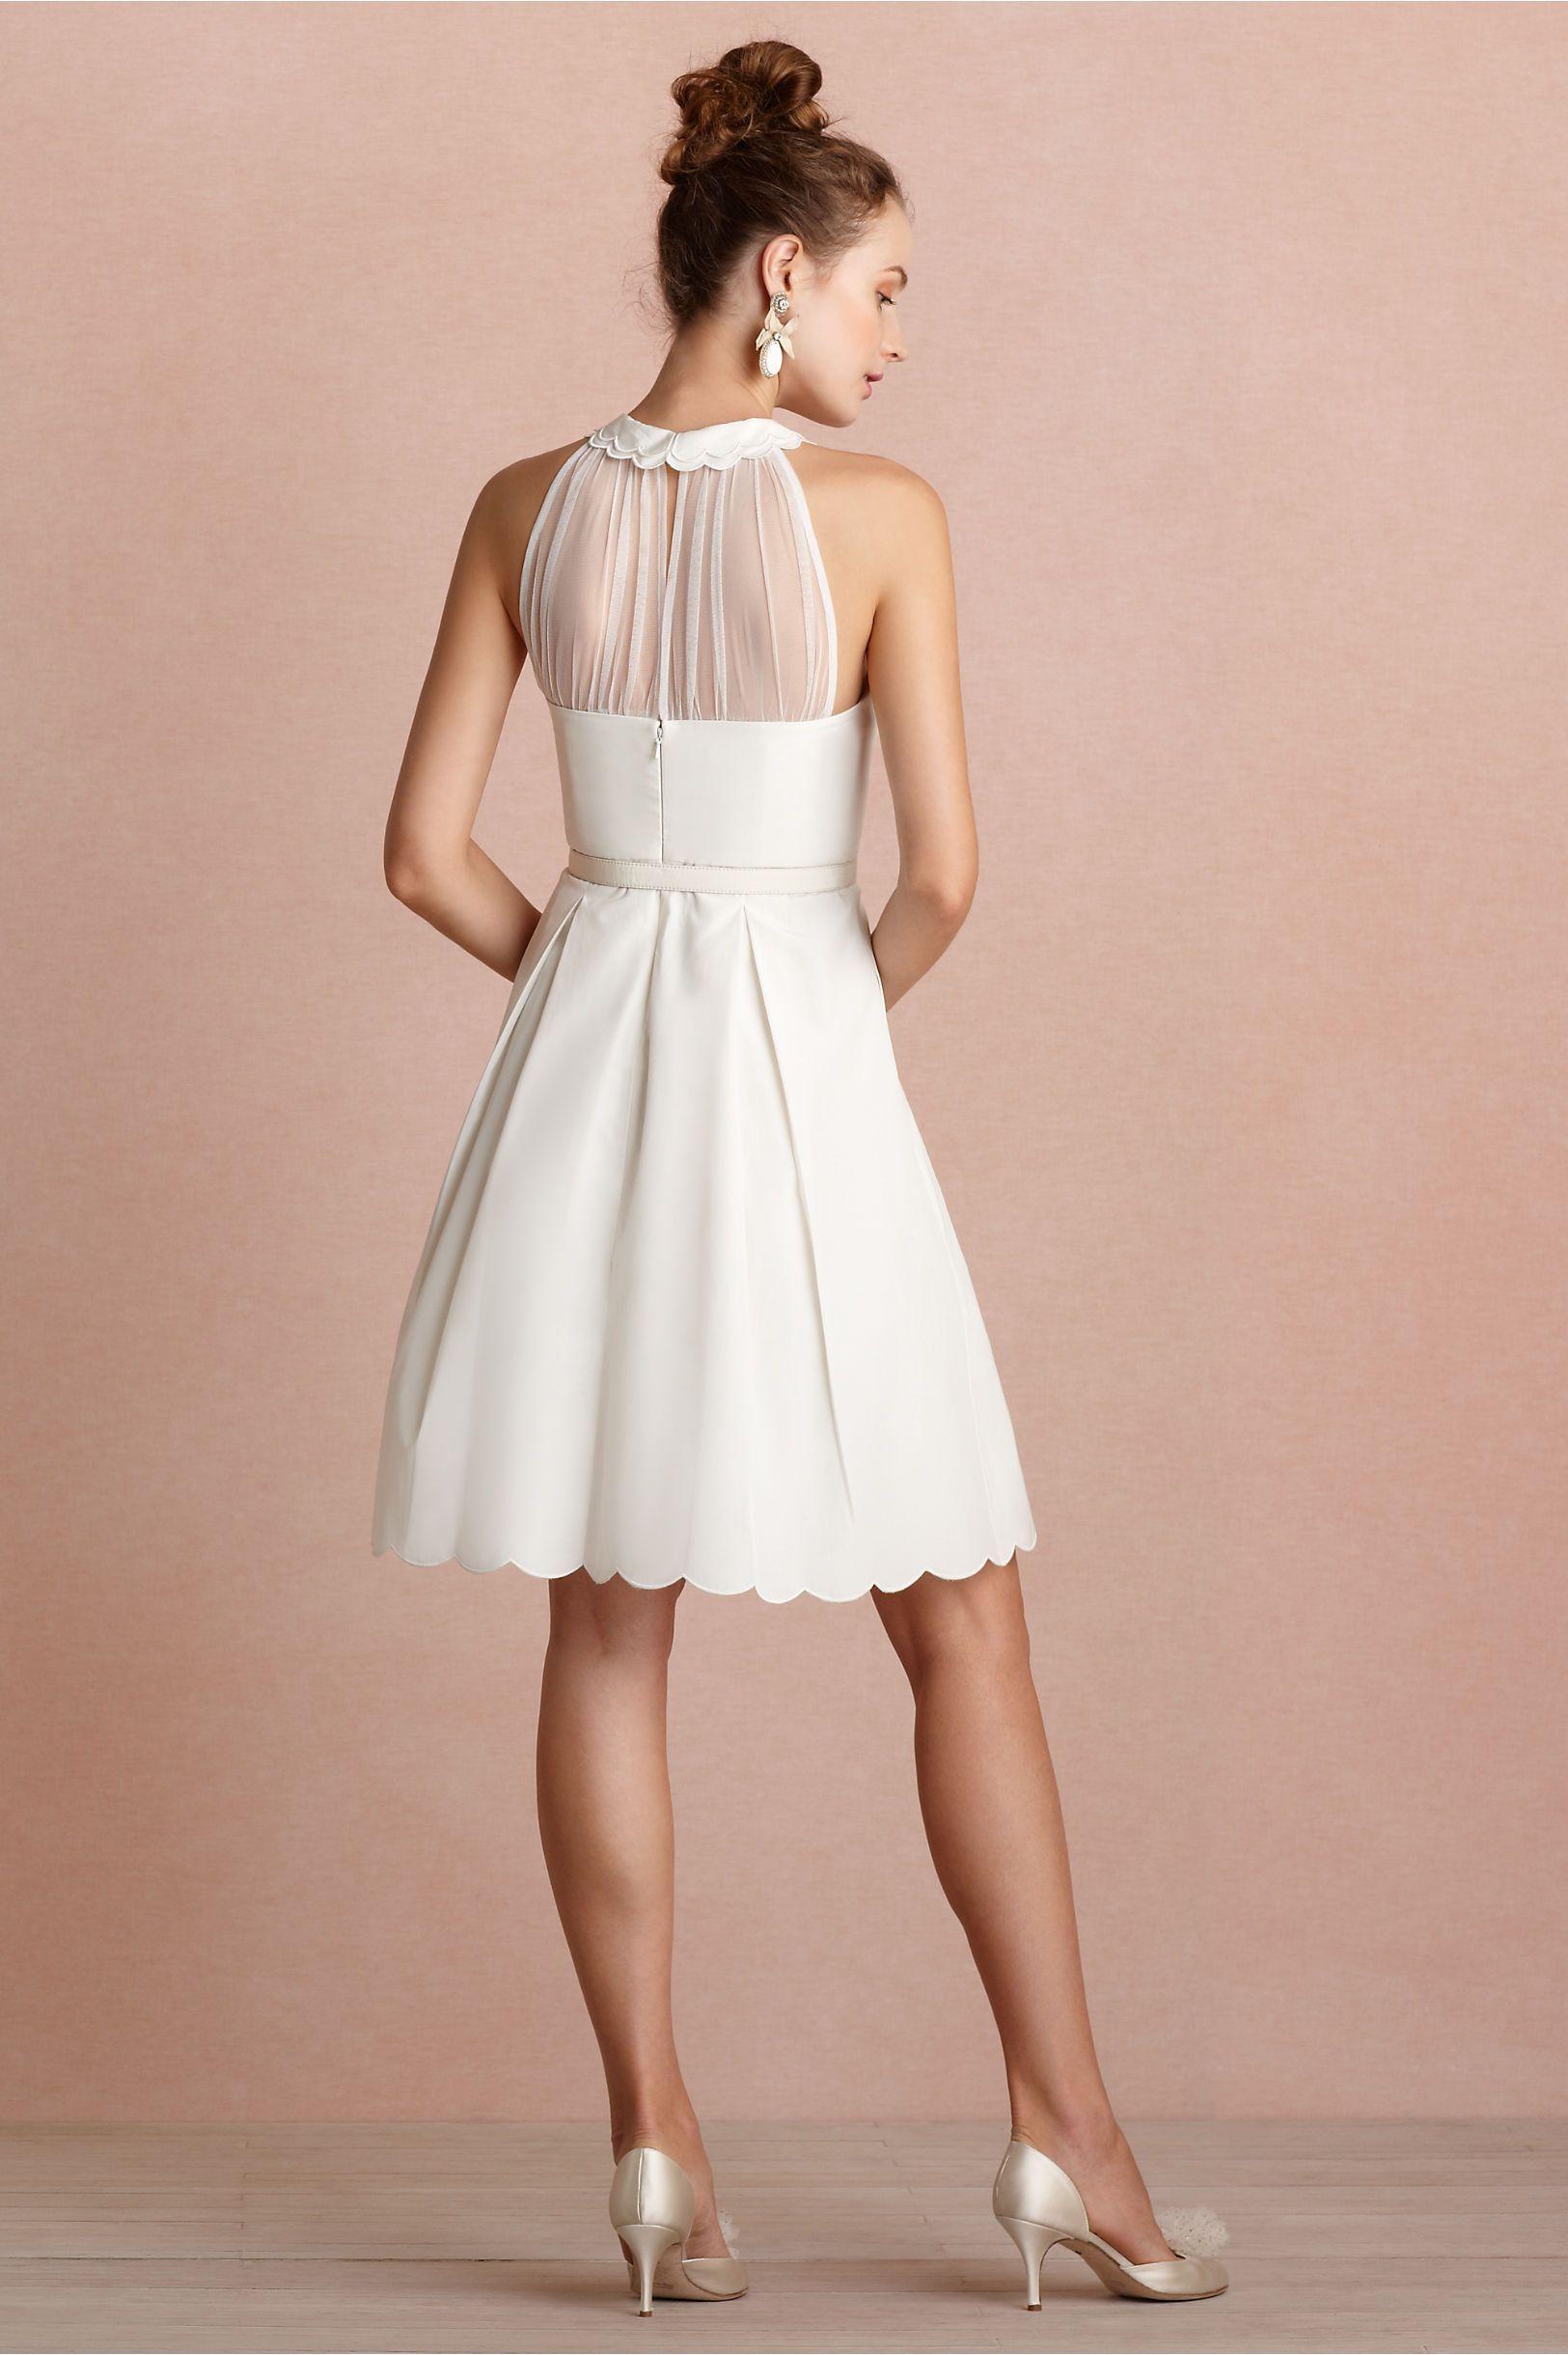 Long wedding reception dresses for the bride  Horizon Dress from BHLDN  Dorsaus wedding  Pinterest  Engagement